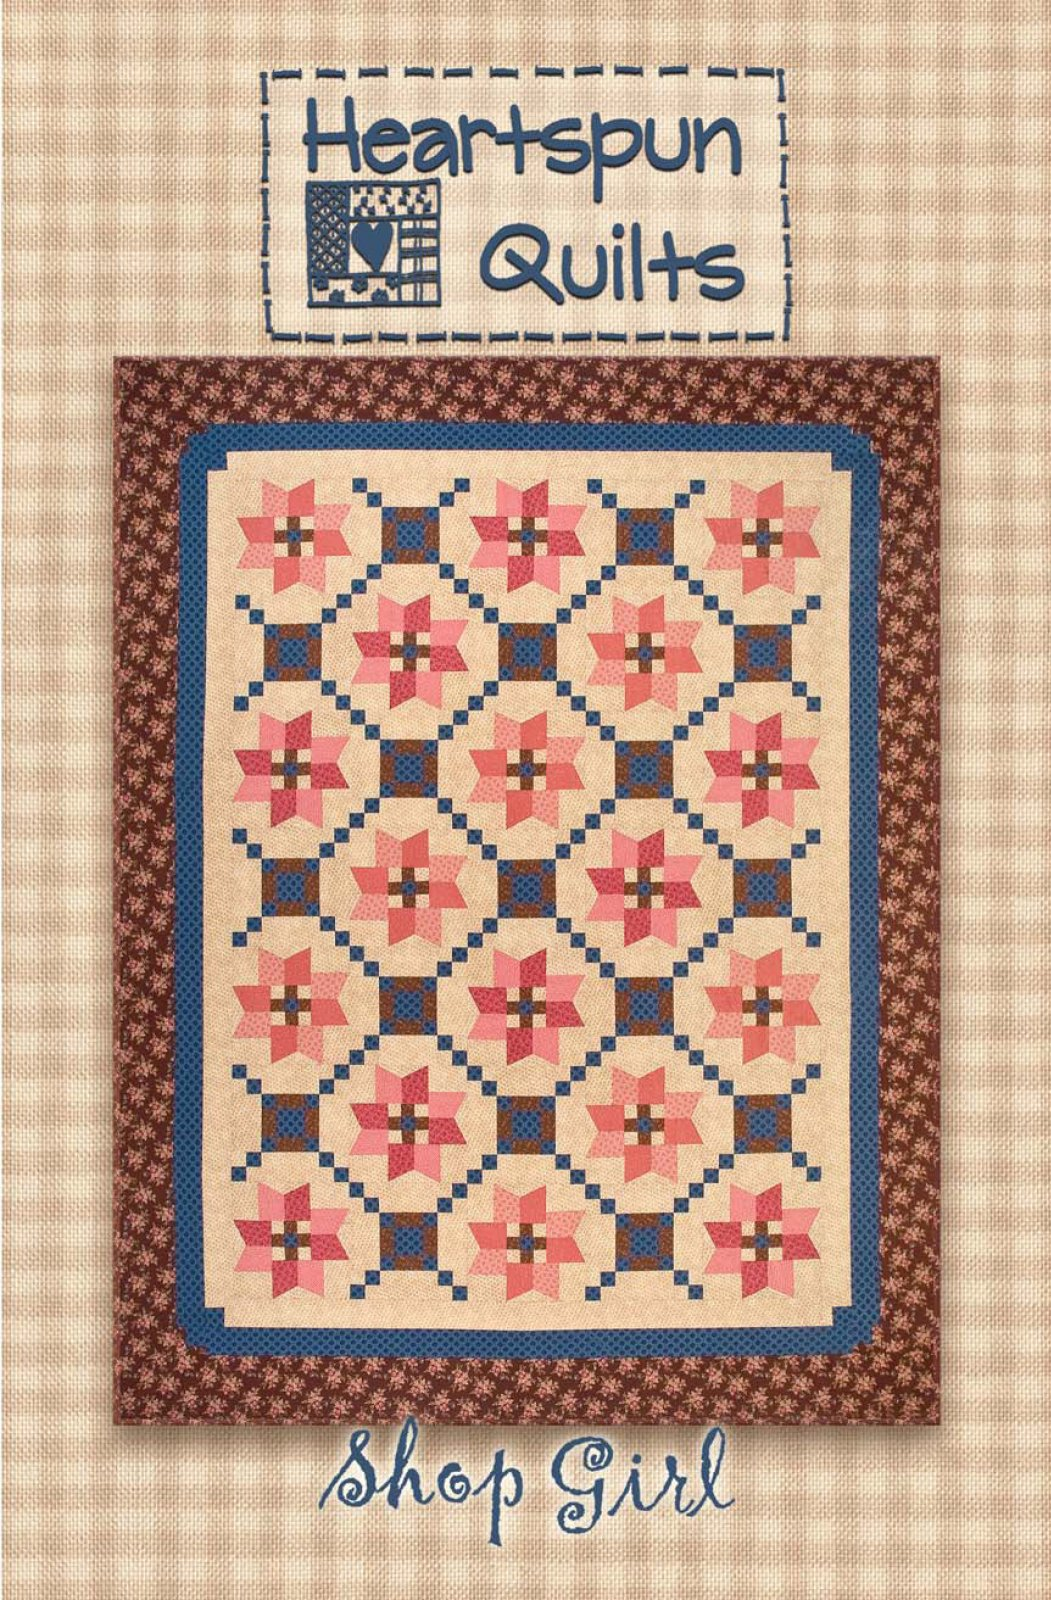 Shop Girl Quilt ~ Pattern Download